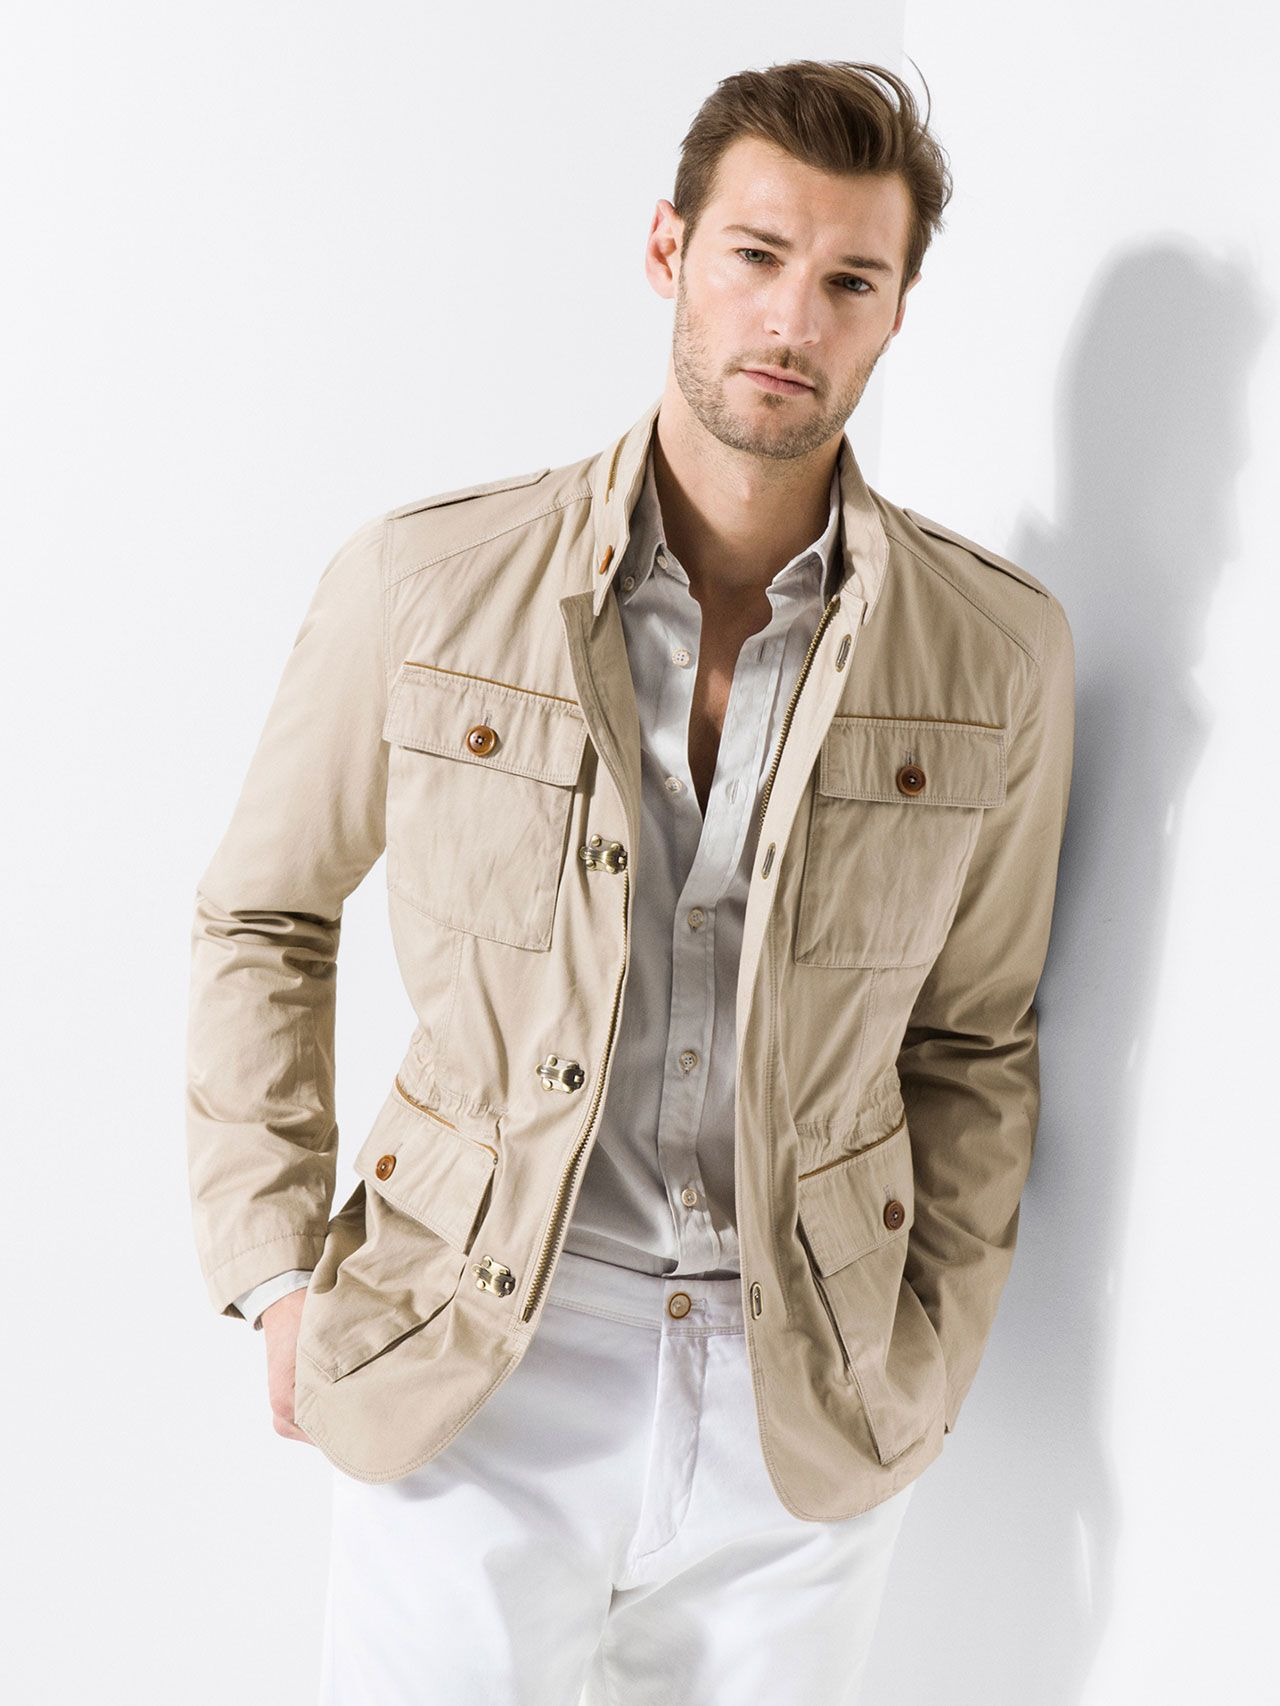 Mens khaki jacket casual - Textured Weave Cotton Safari Jacket Men Massimo Dutti Dan Murphy